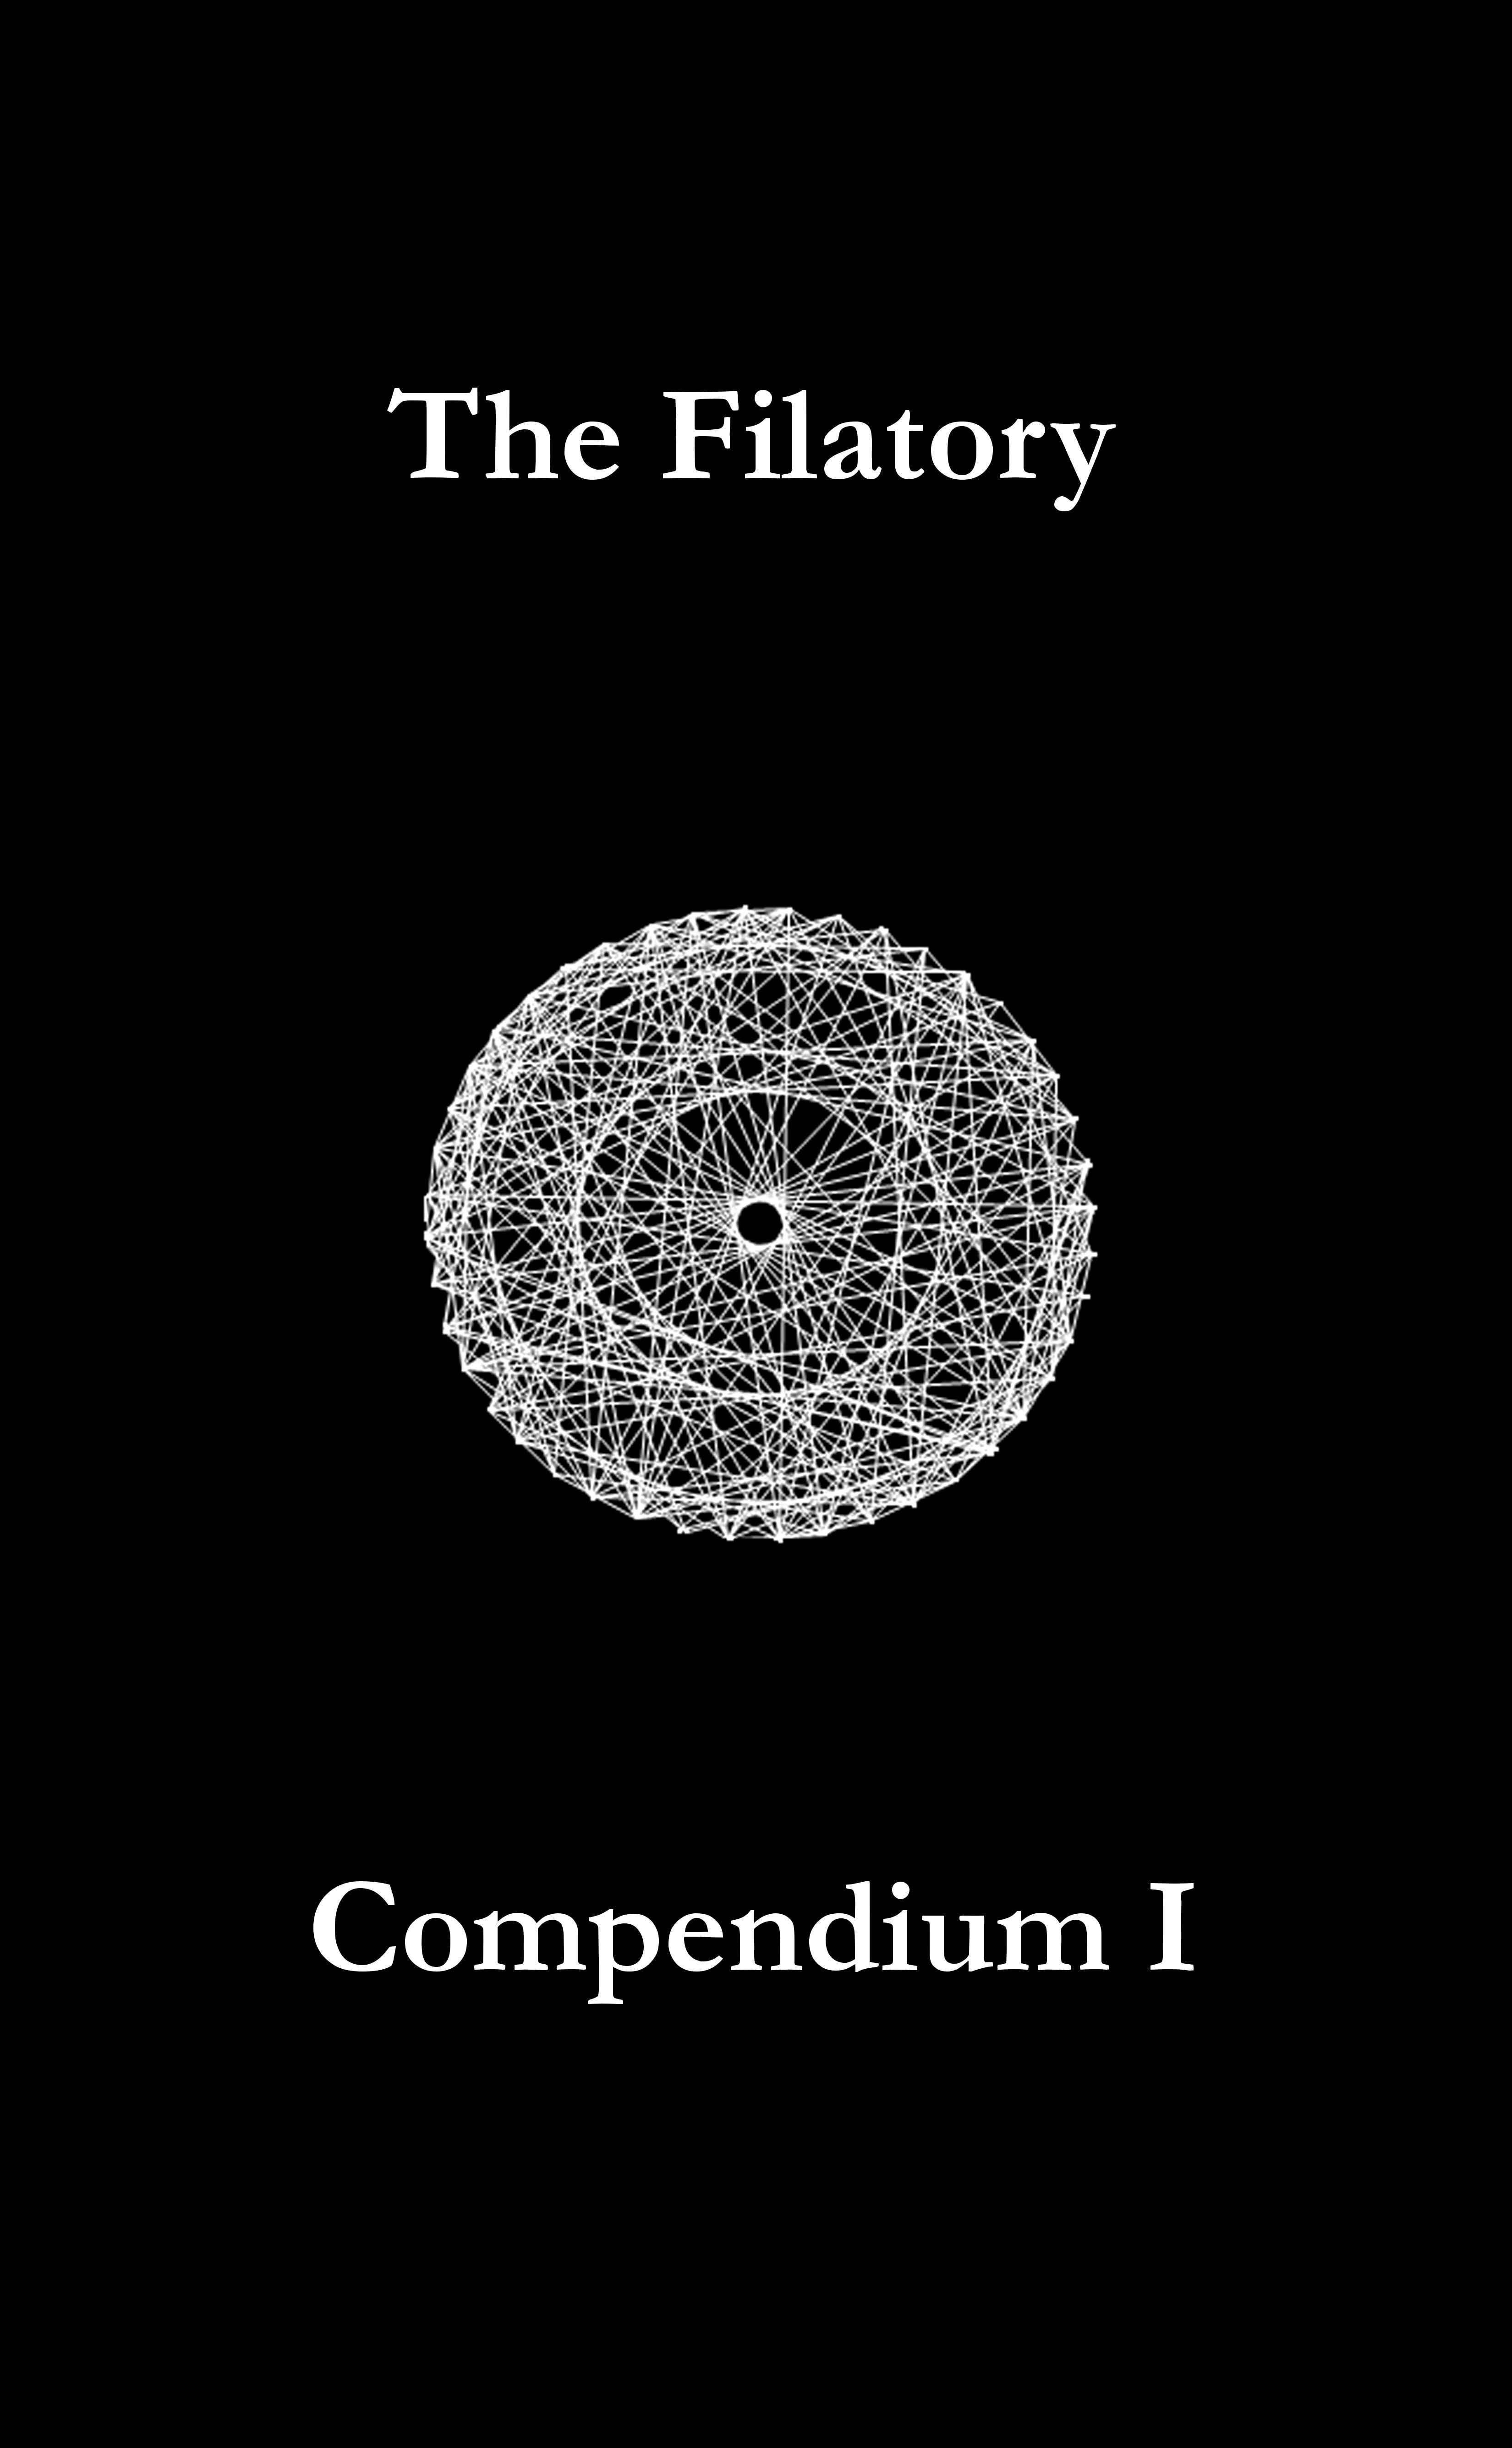 The Filatory: Compendium I | gnOme